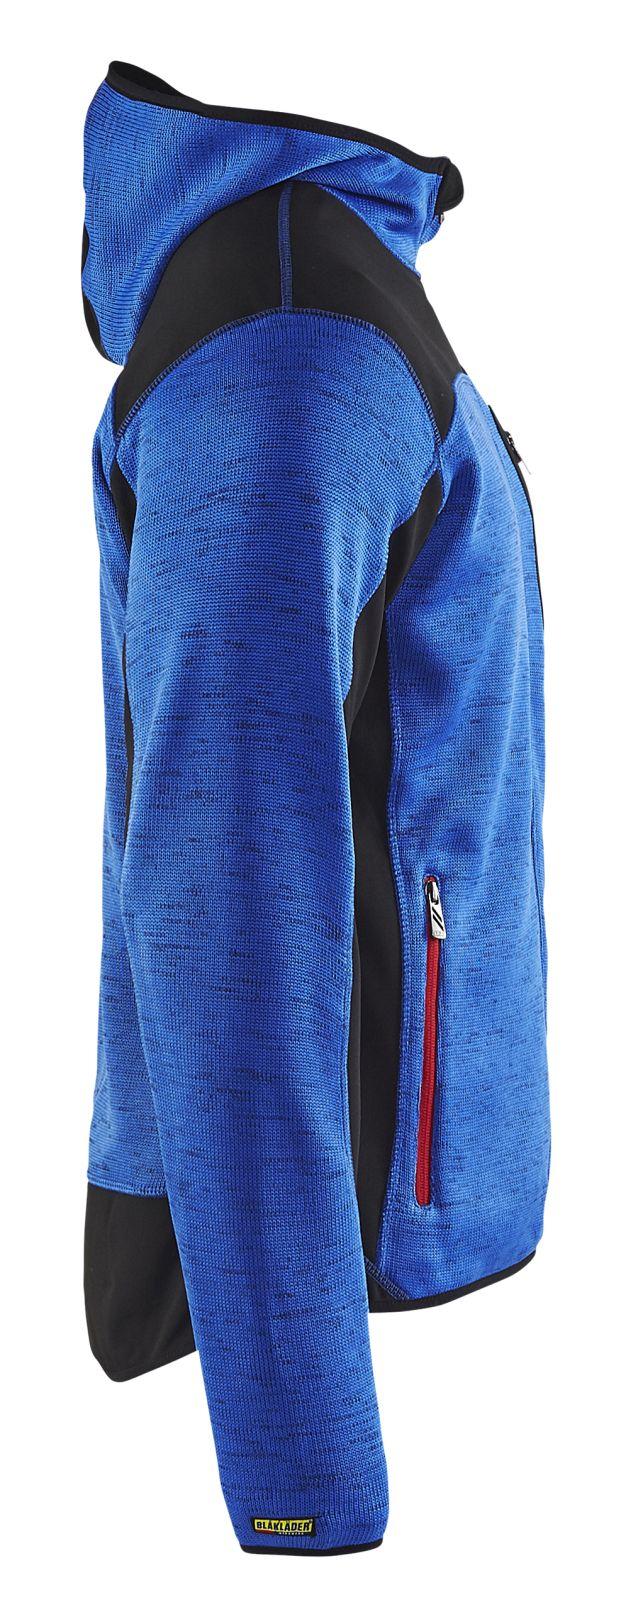 Blaklader Gebreide vesten 49302117 korenblauw-zwart(8599)